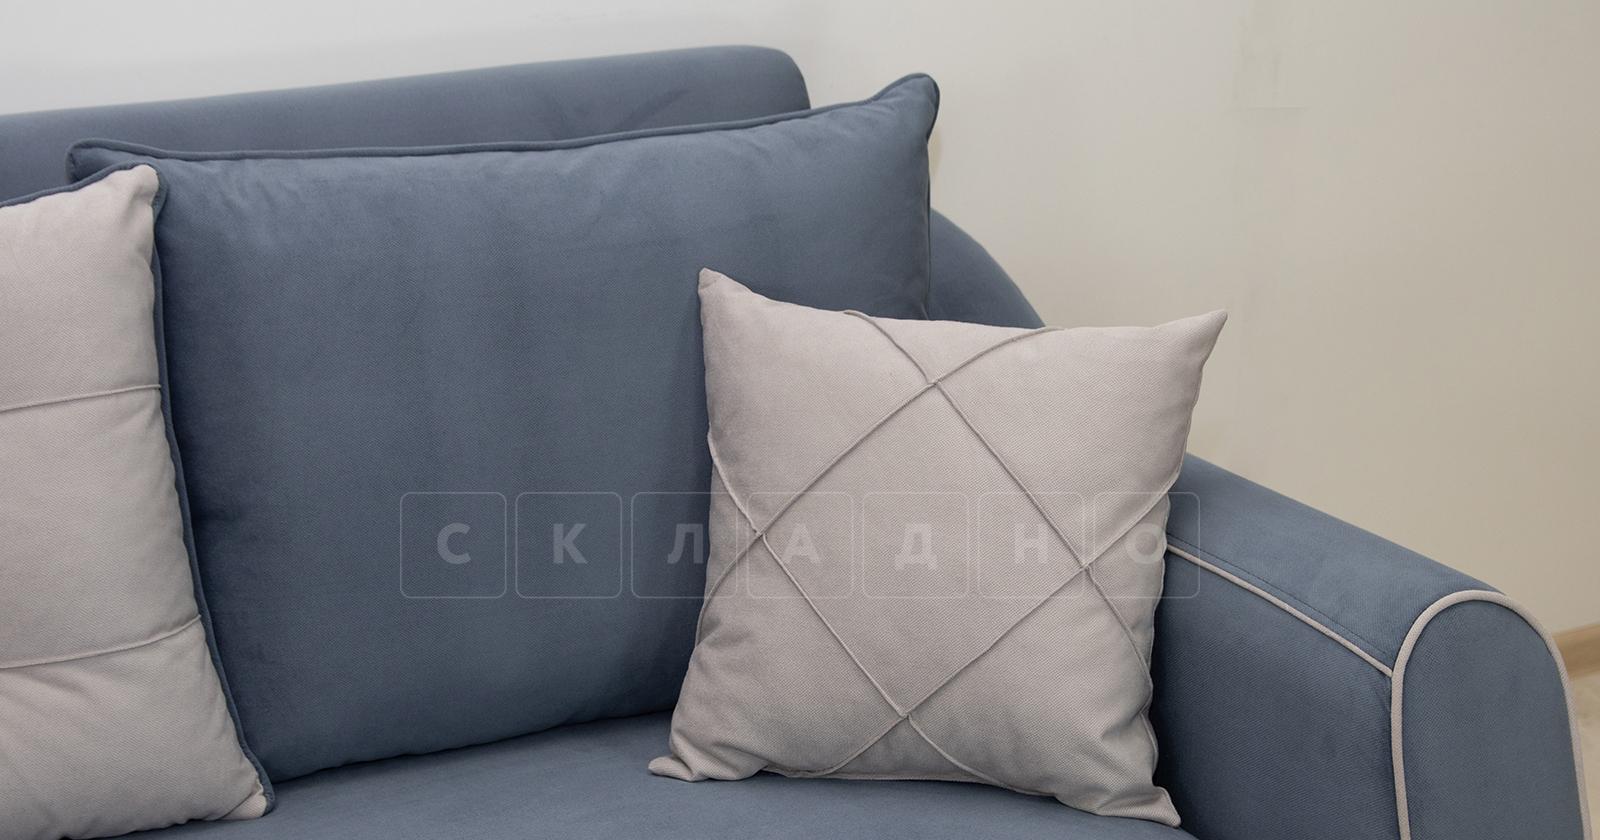 Диван-кровать Флэтфорд серо-синий фото 7 | интернет-магазин Складно